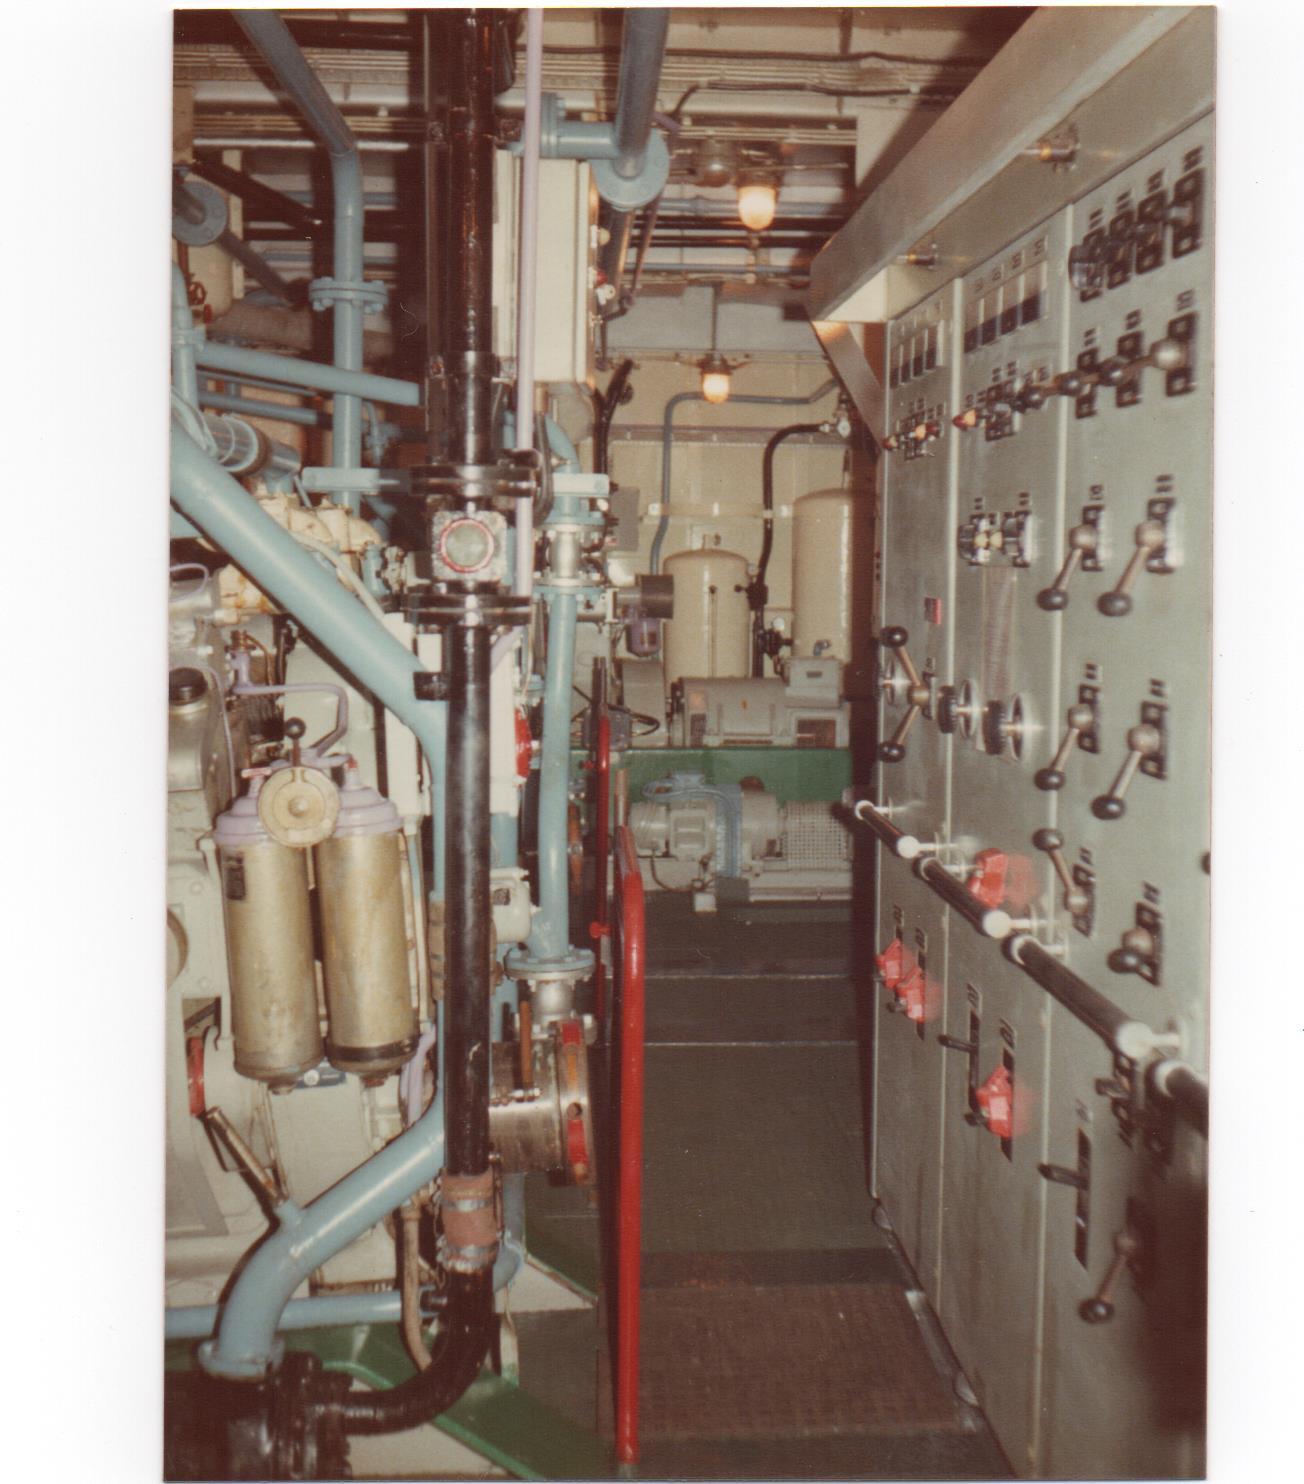 EDIC 9070 Marine44